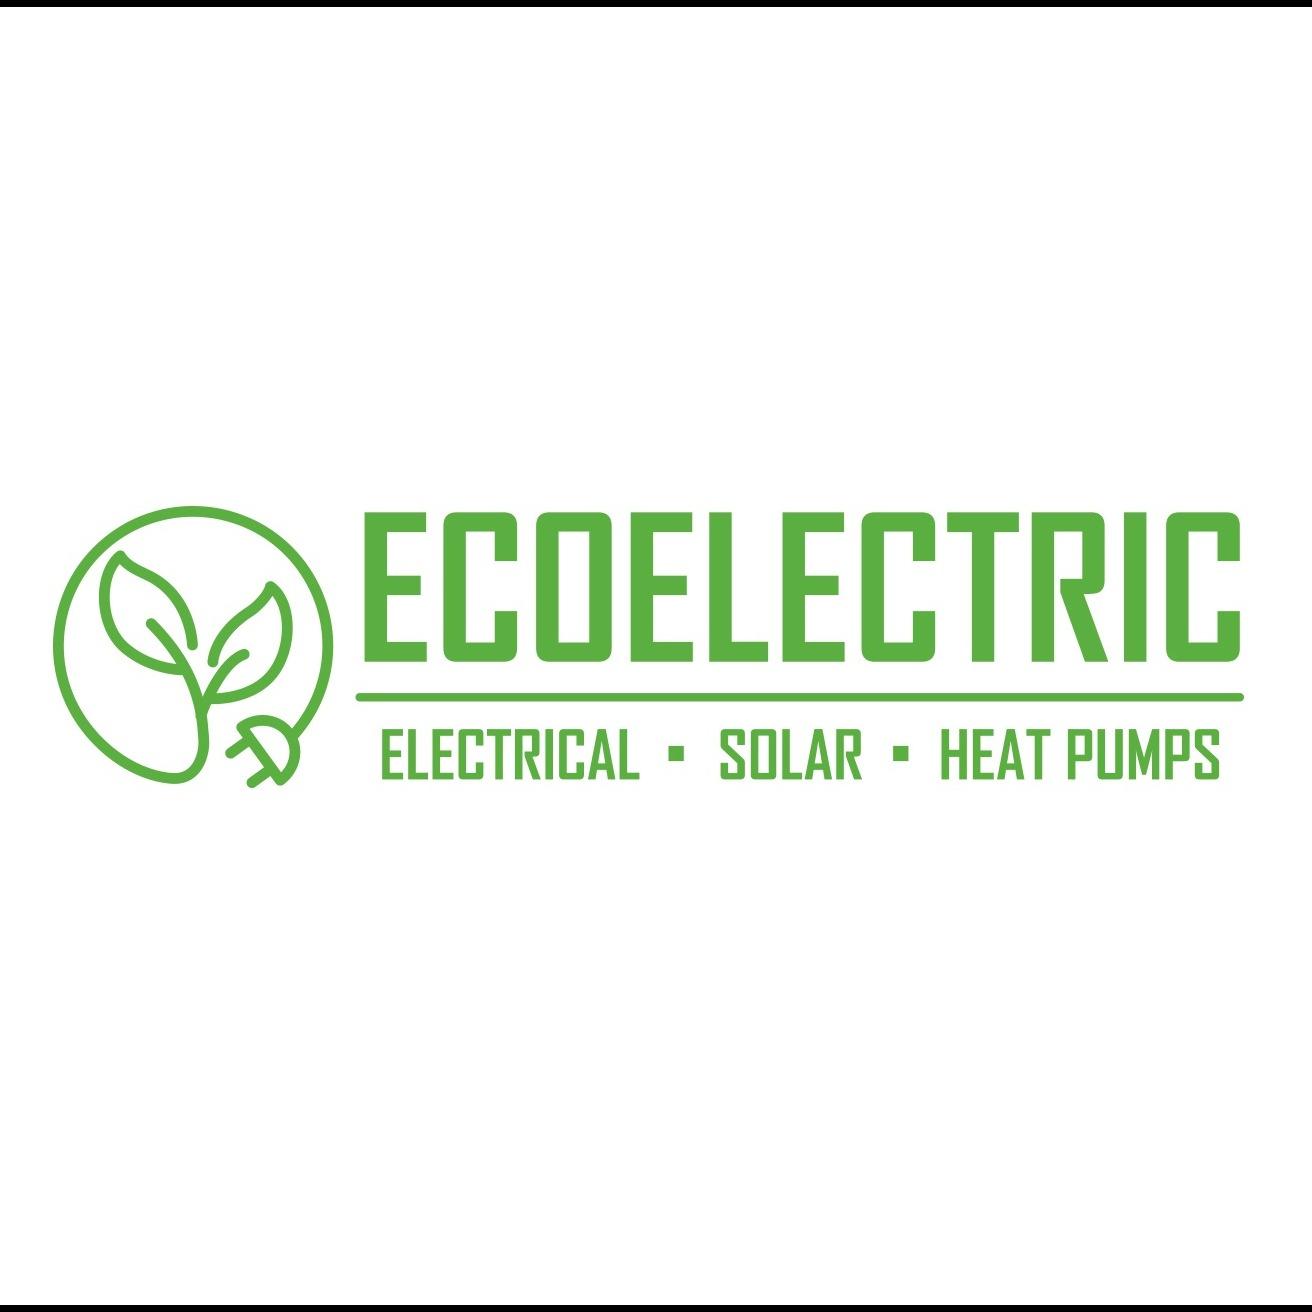 Ecoelectric 2016 Ltd